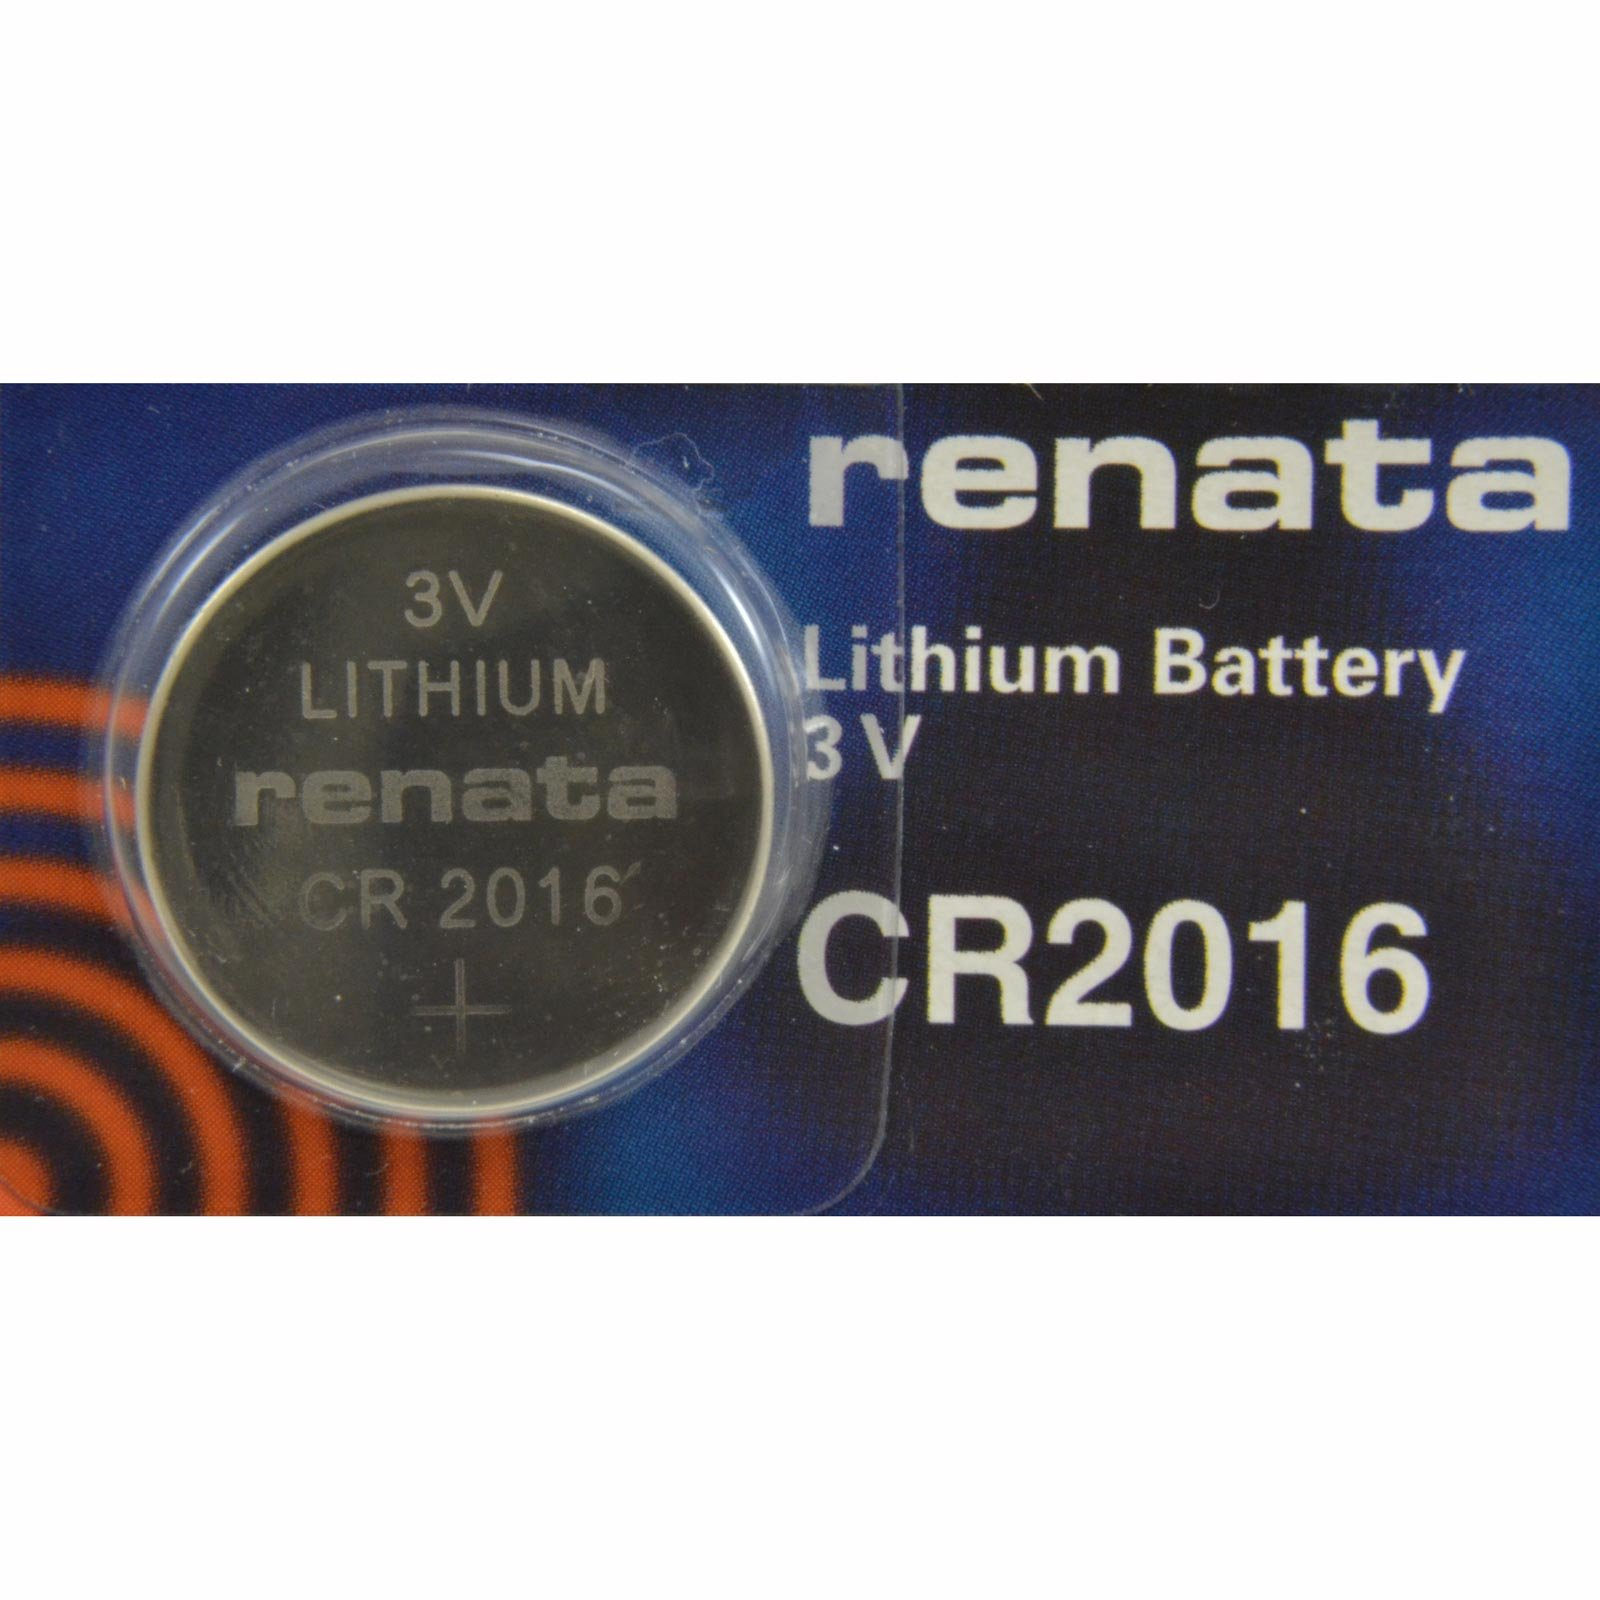 Renata CR2016 watch battery